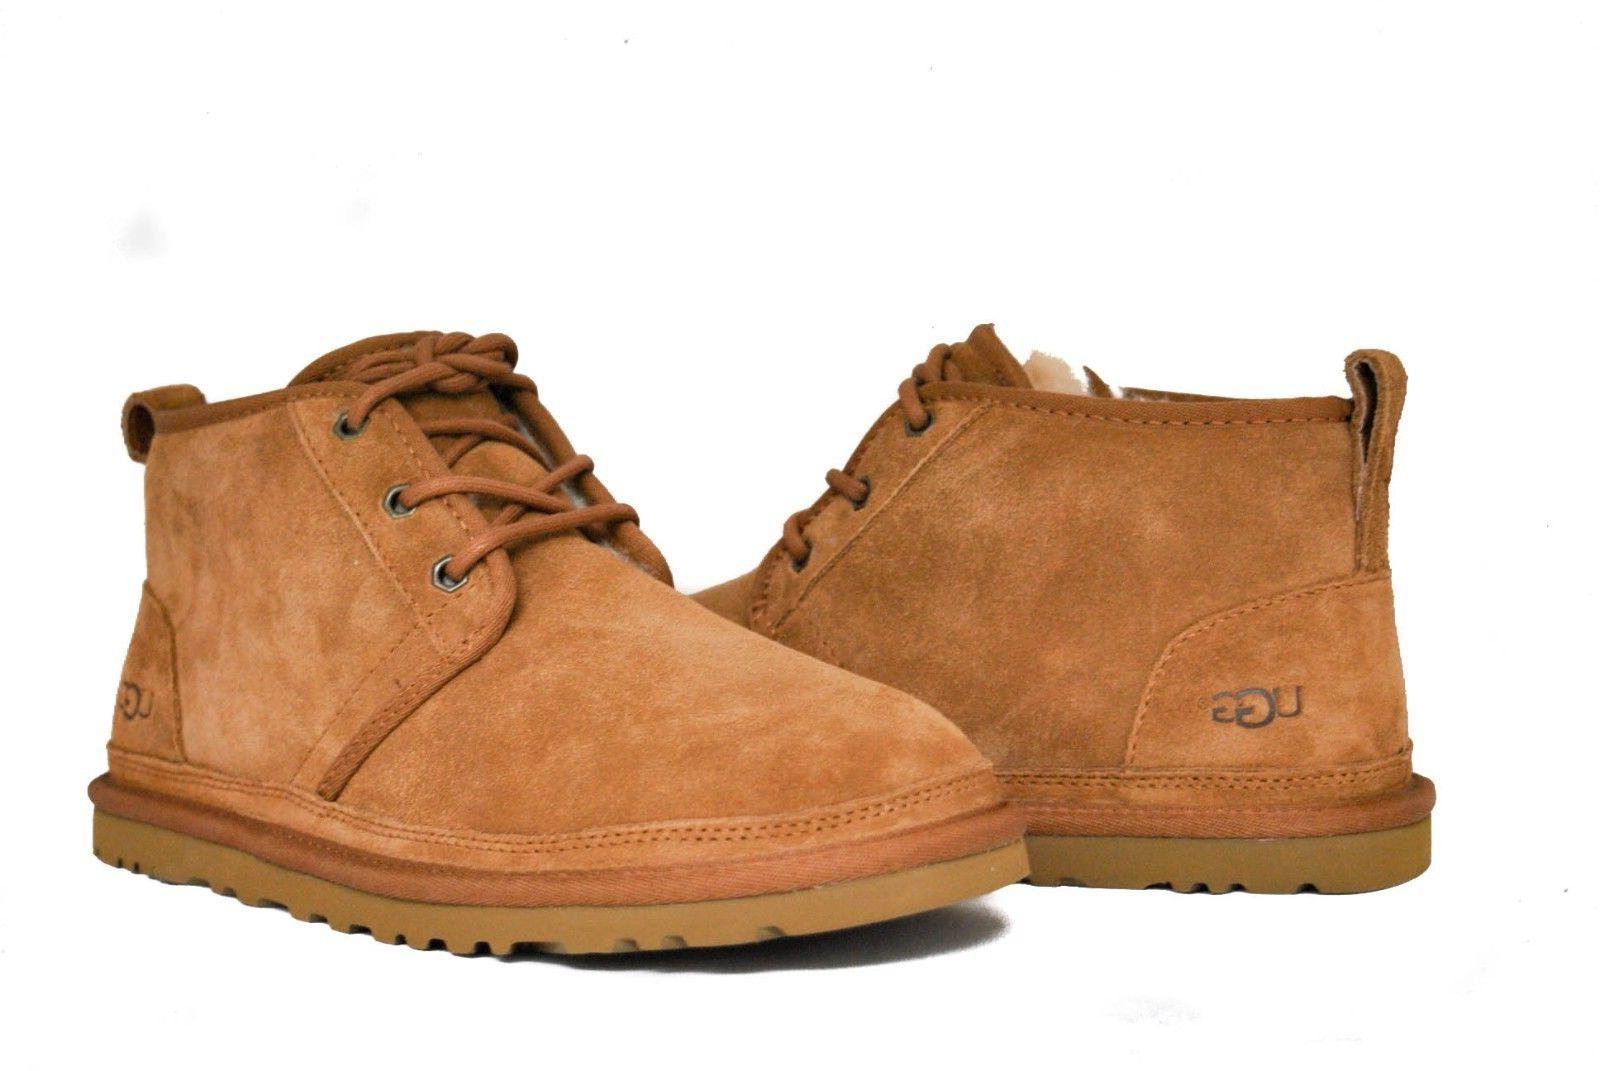 UGG Australia Men's Neumel 3236 Shoes Chestnut Suede Sz 7-14